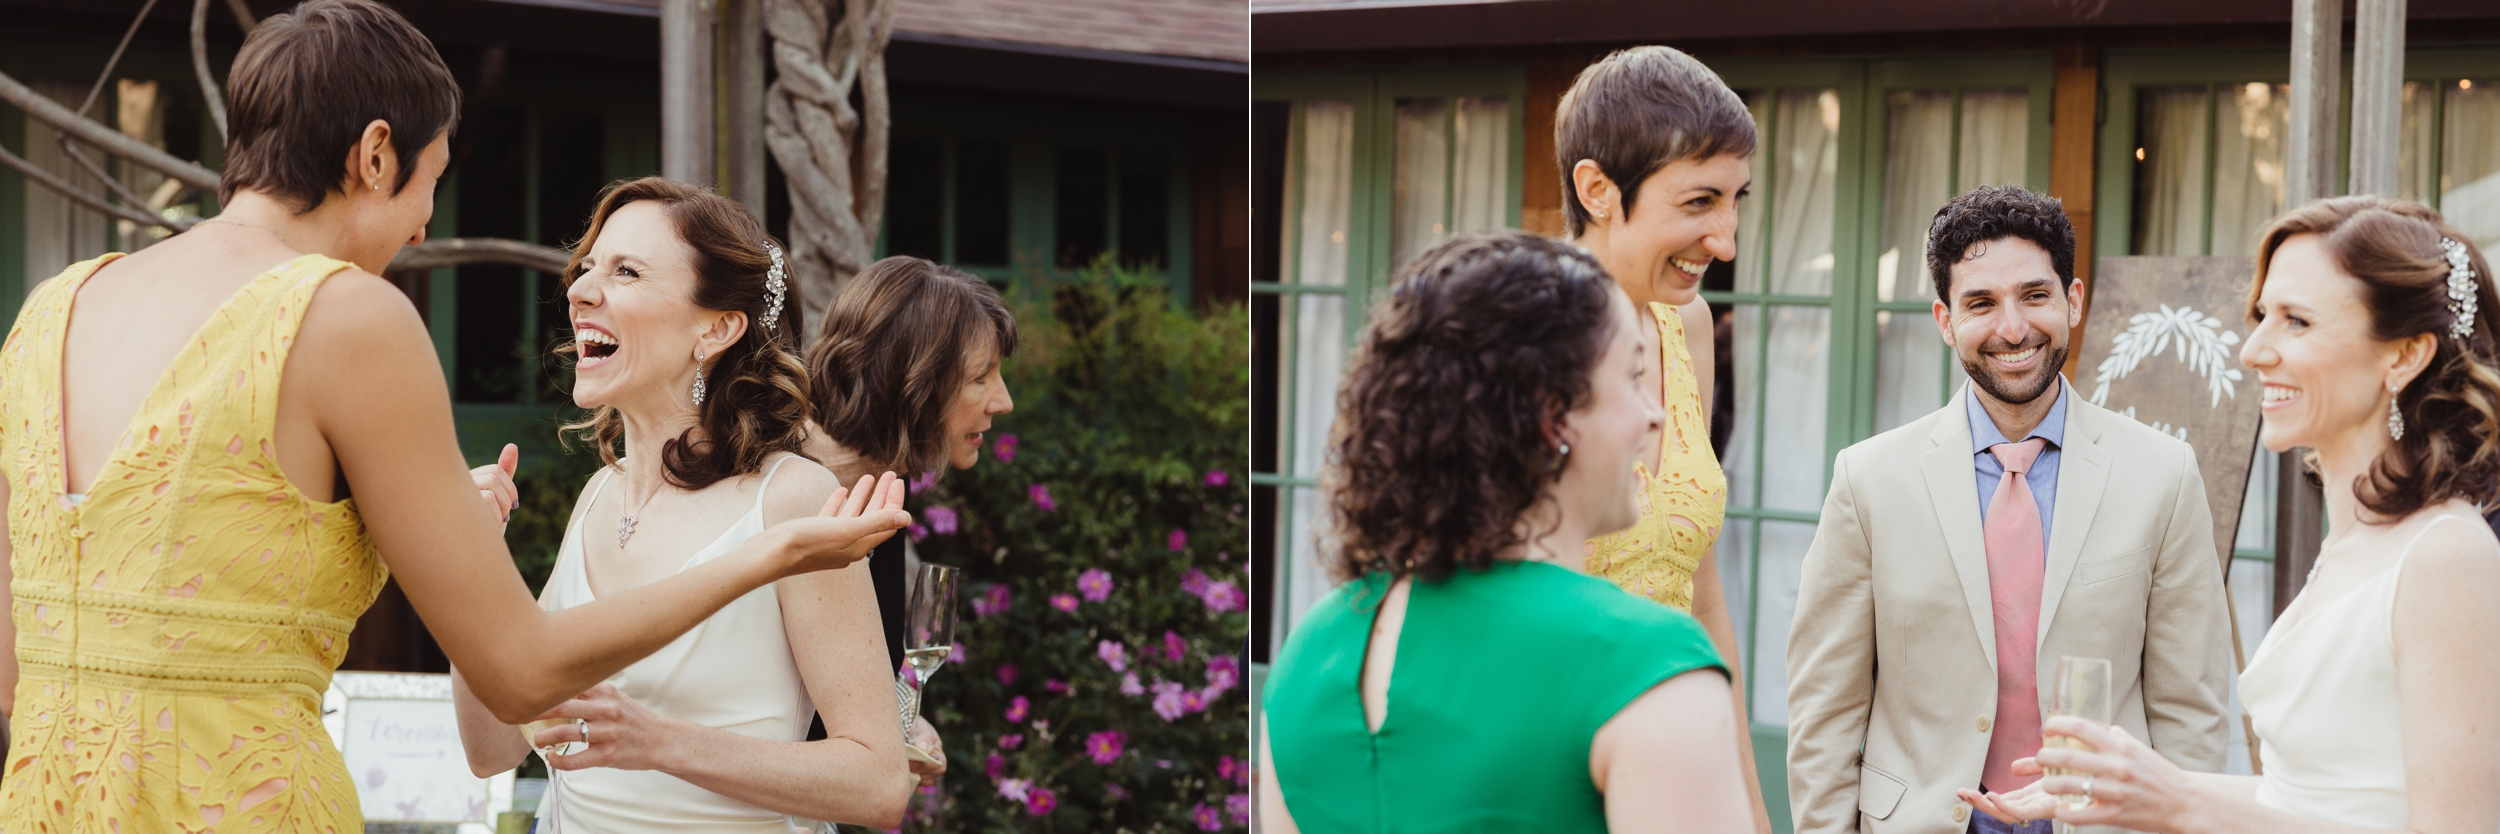 49-outdoor-art-club-wedding-vivianchen-468_WEB.jpg